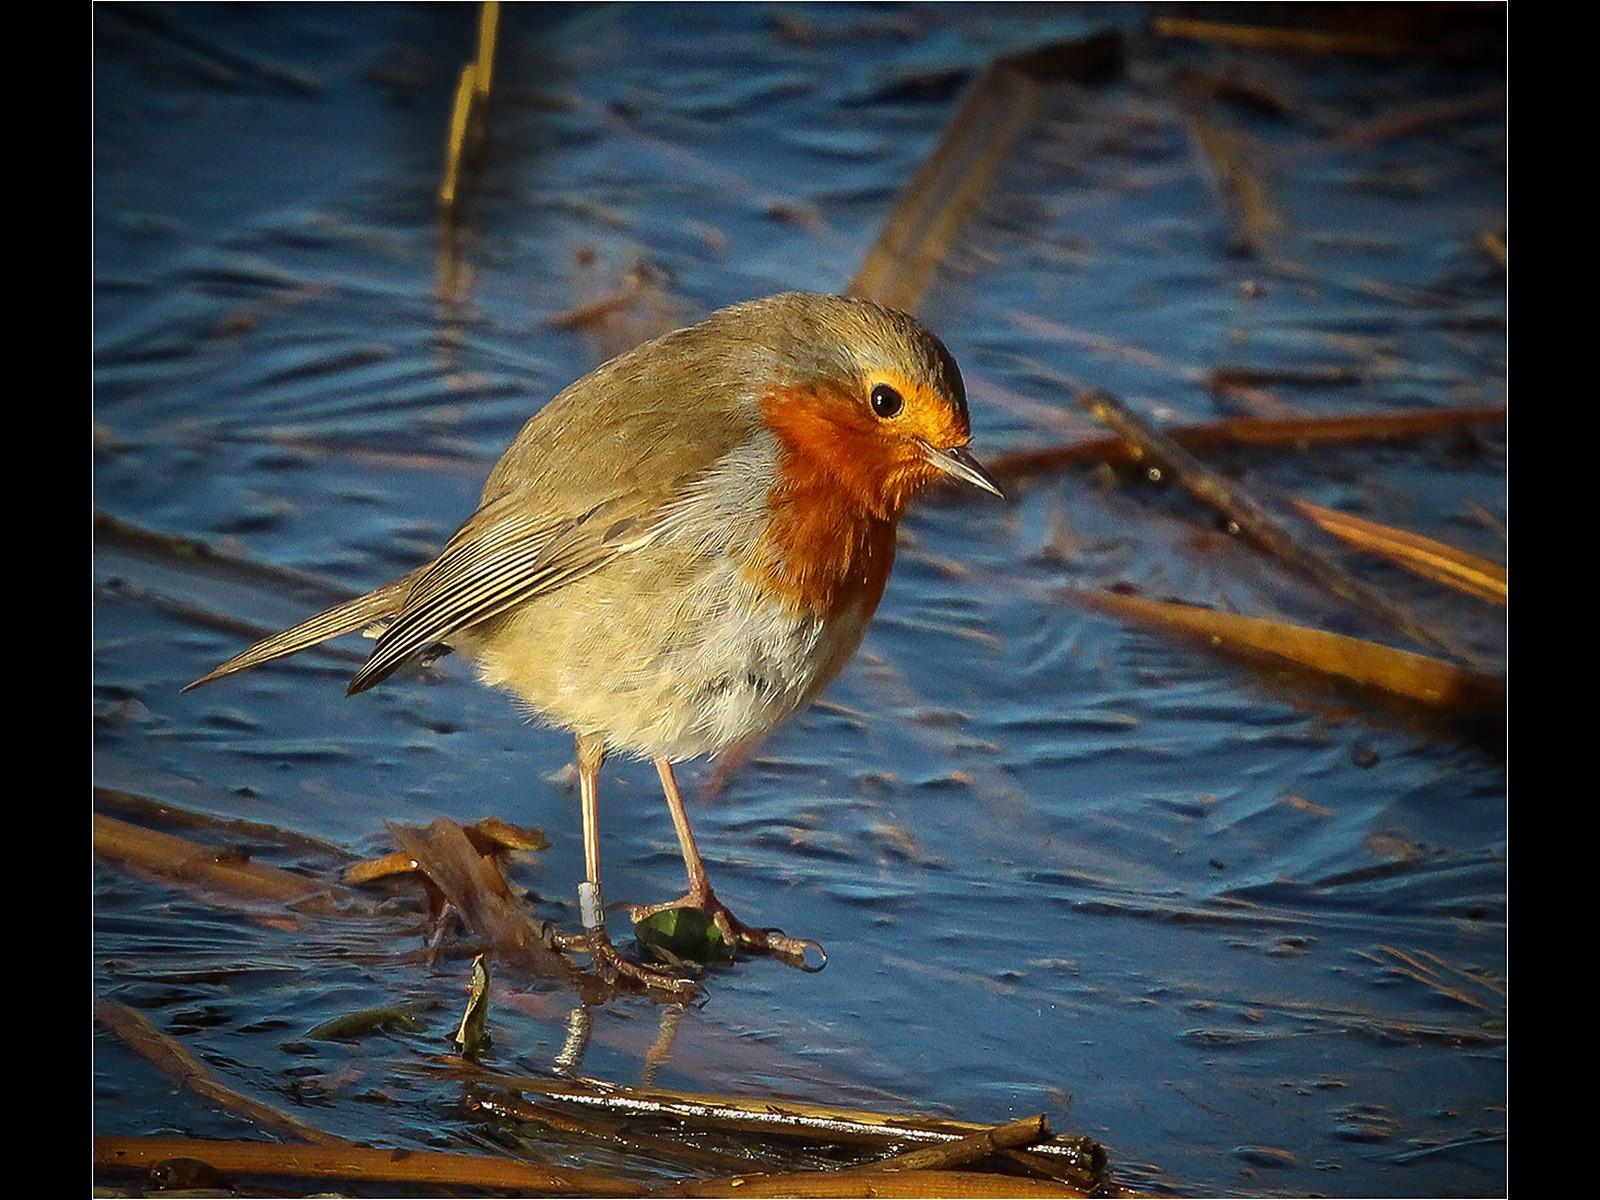 13. A Christmas Robin